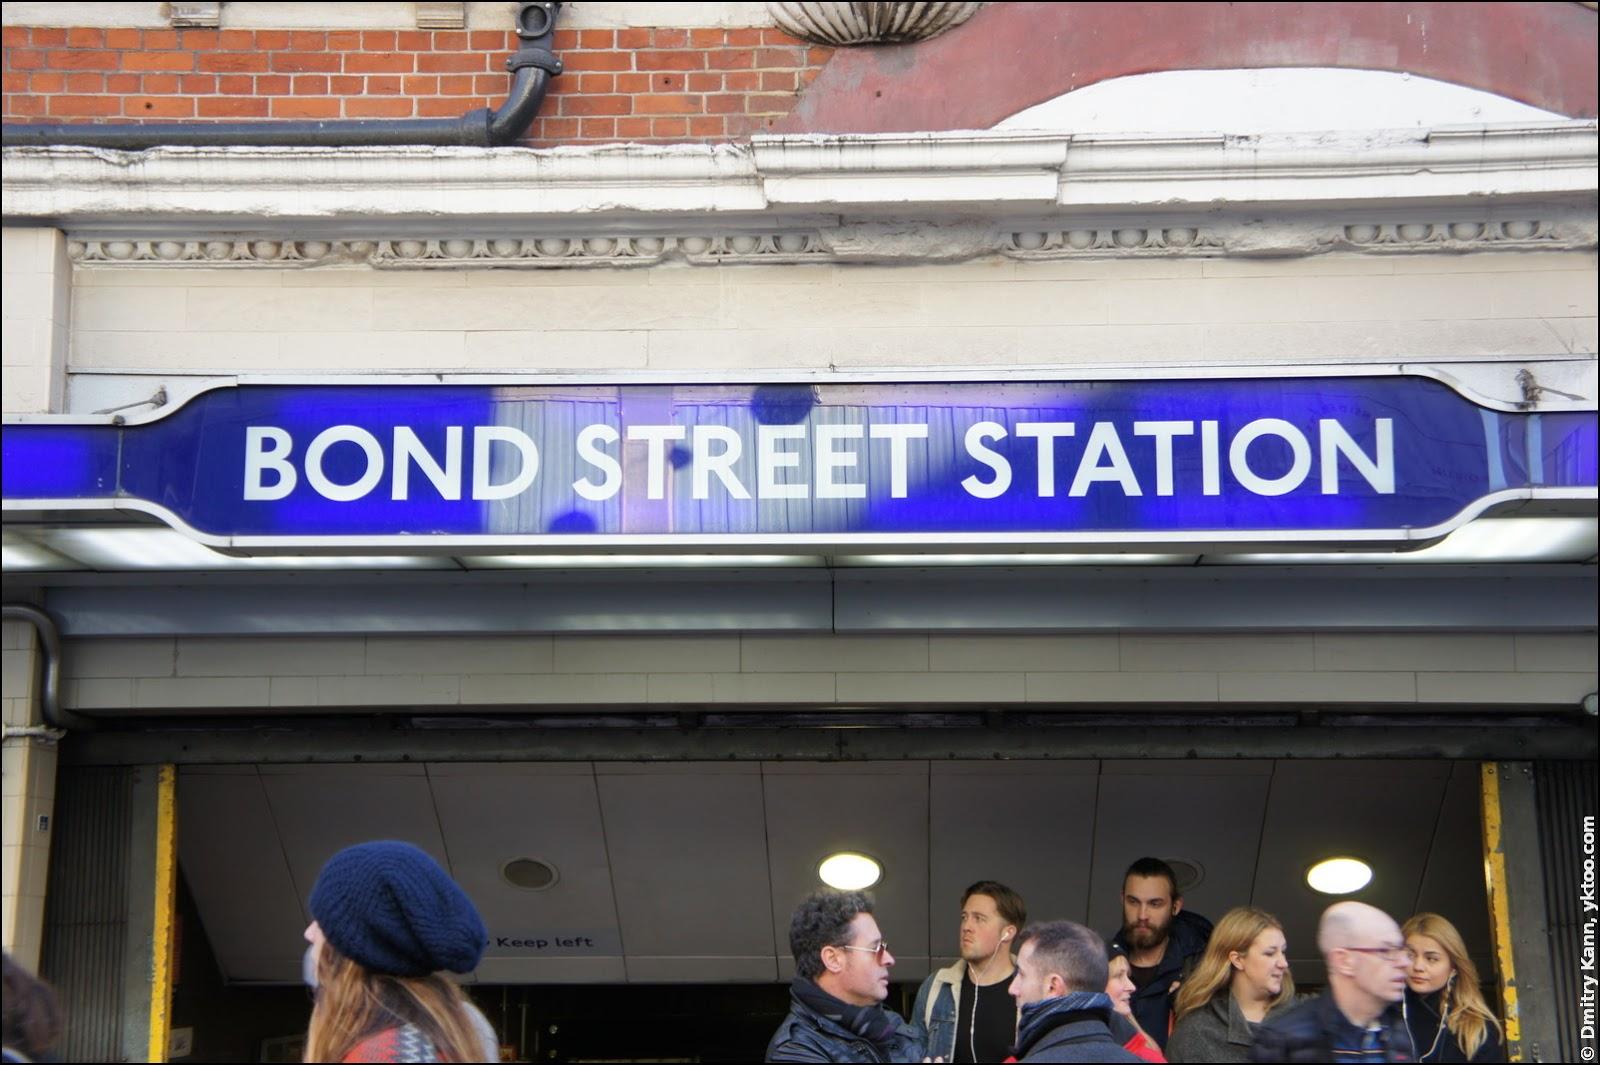 Оксфорд-стрит и станция метро Bond Street.